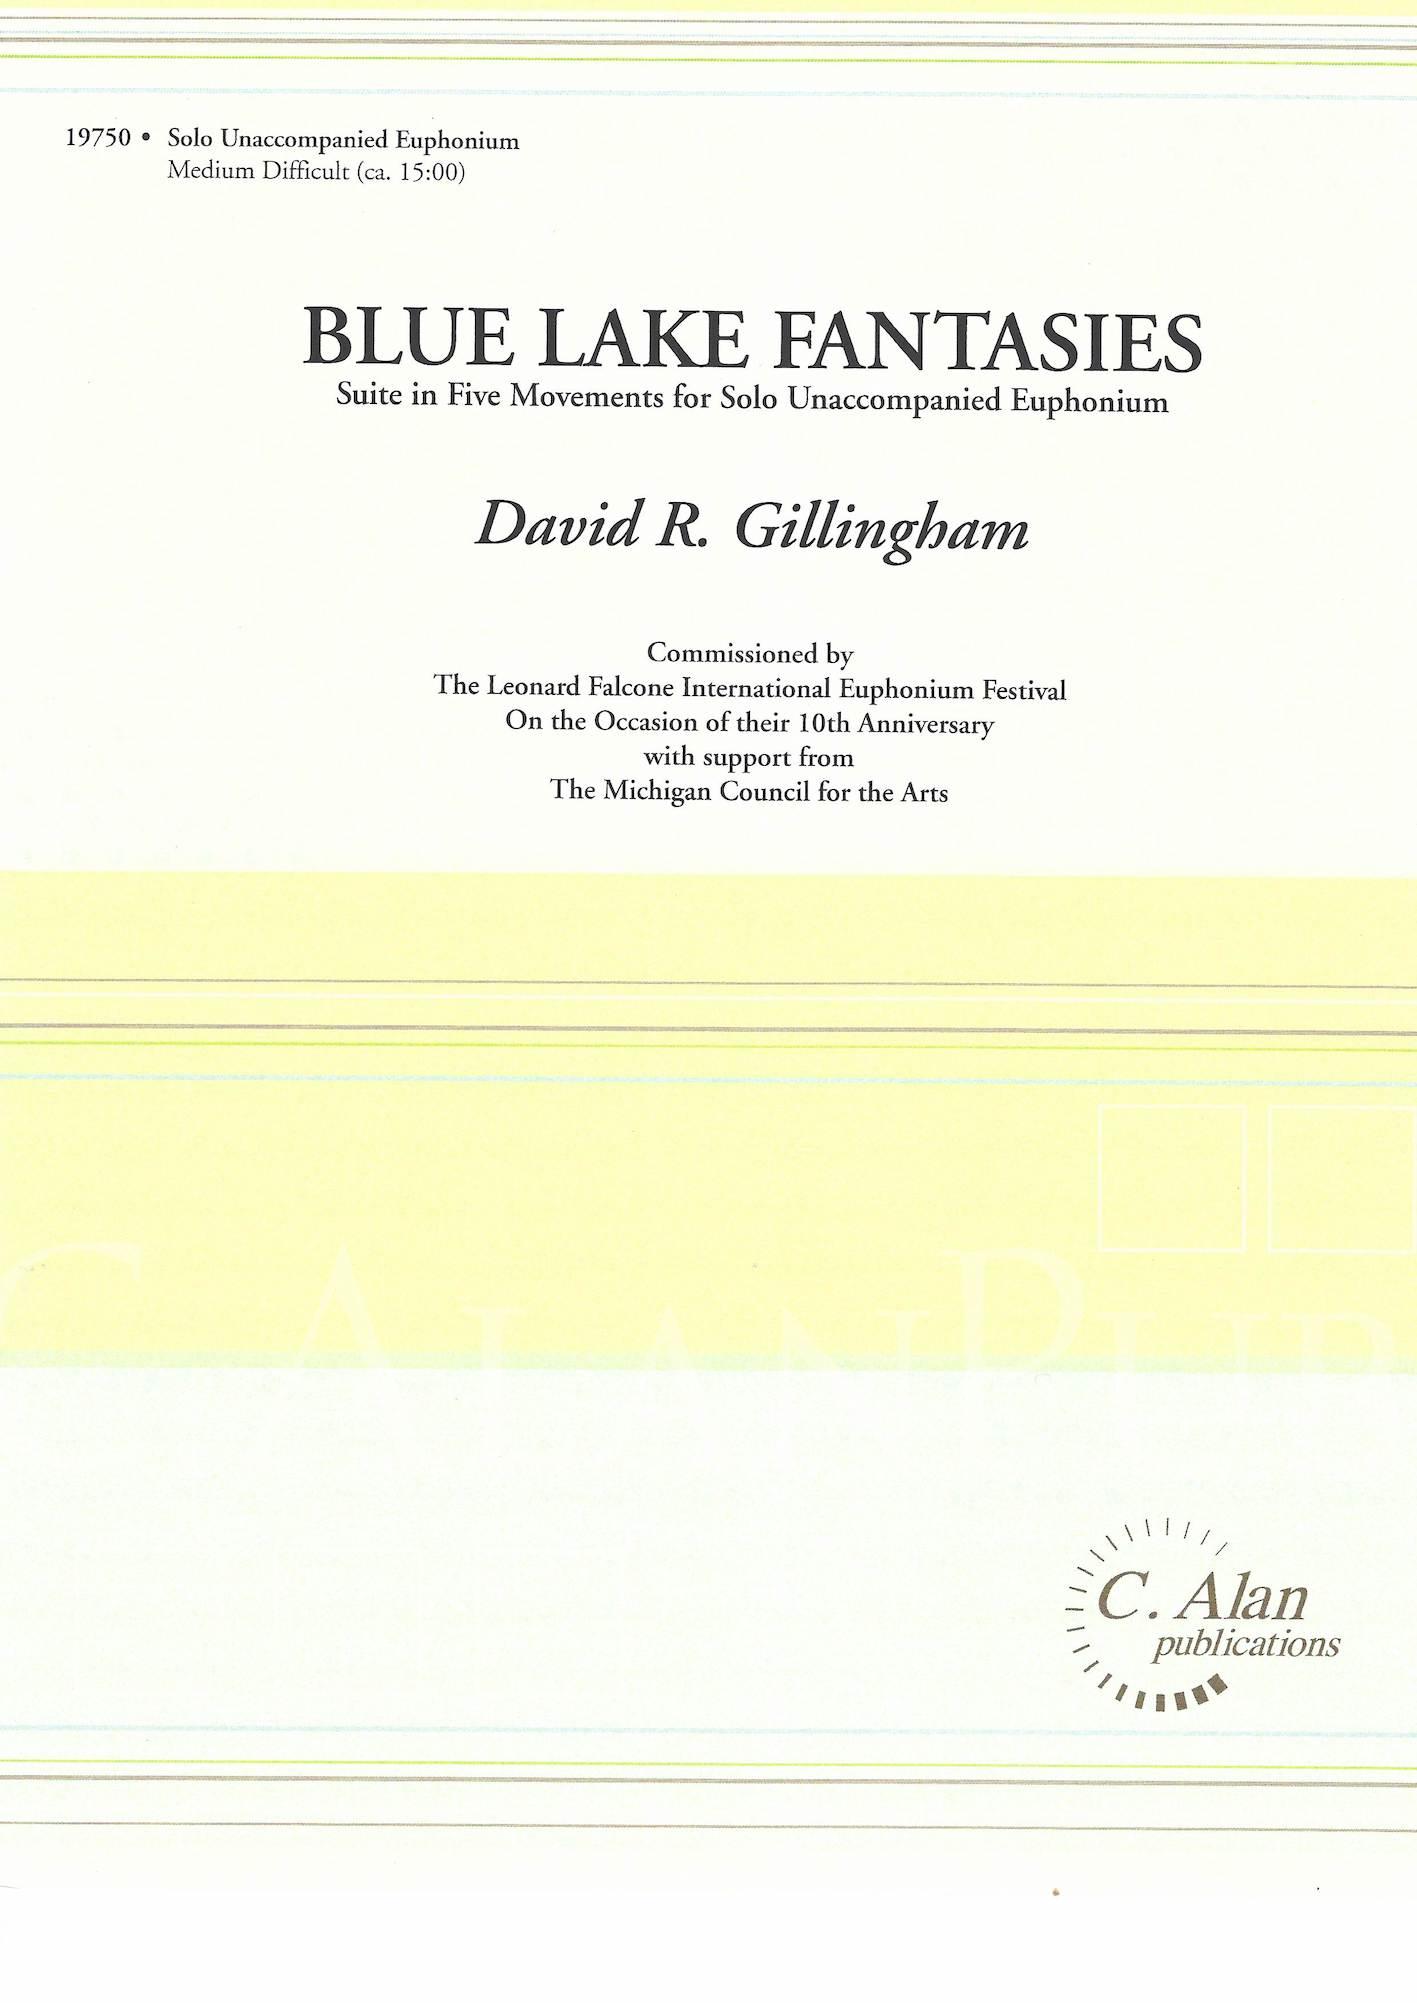 Blue Lake Fantasies (Suite in Five Movements) - David Gillingham - Unaccompanied Solo Euphonium